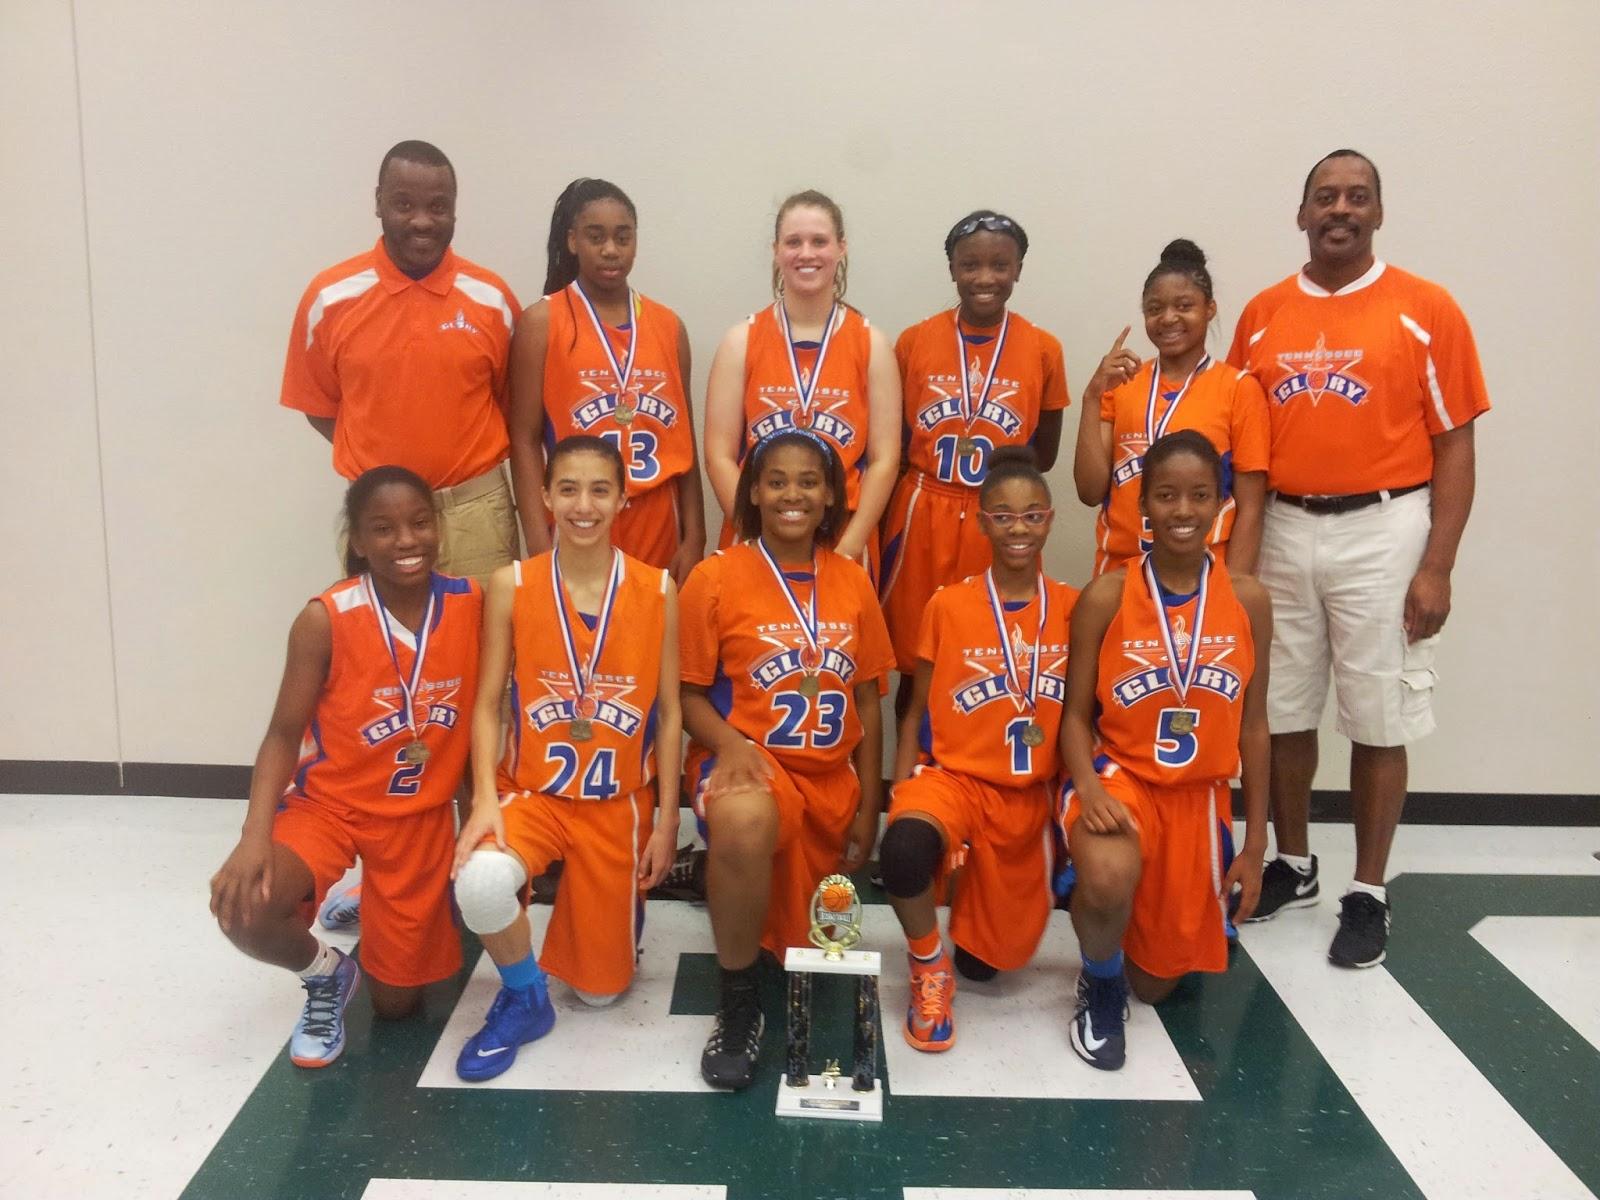 Memphis Girls Basketball: Team Tennessee Glory 9th Grade